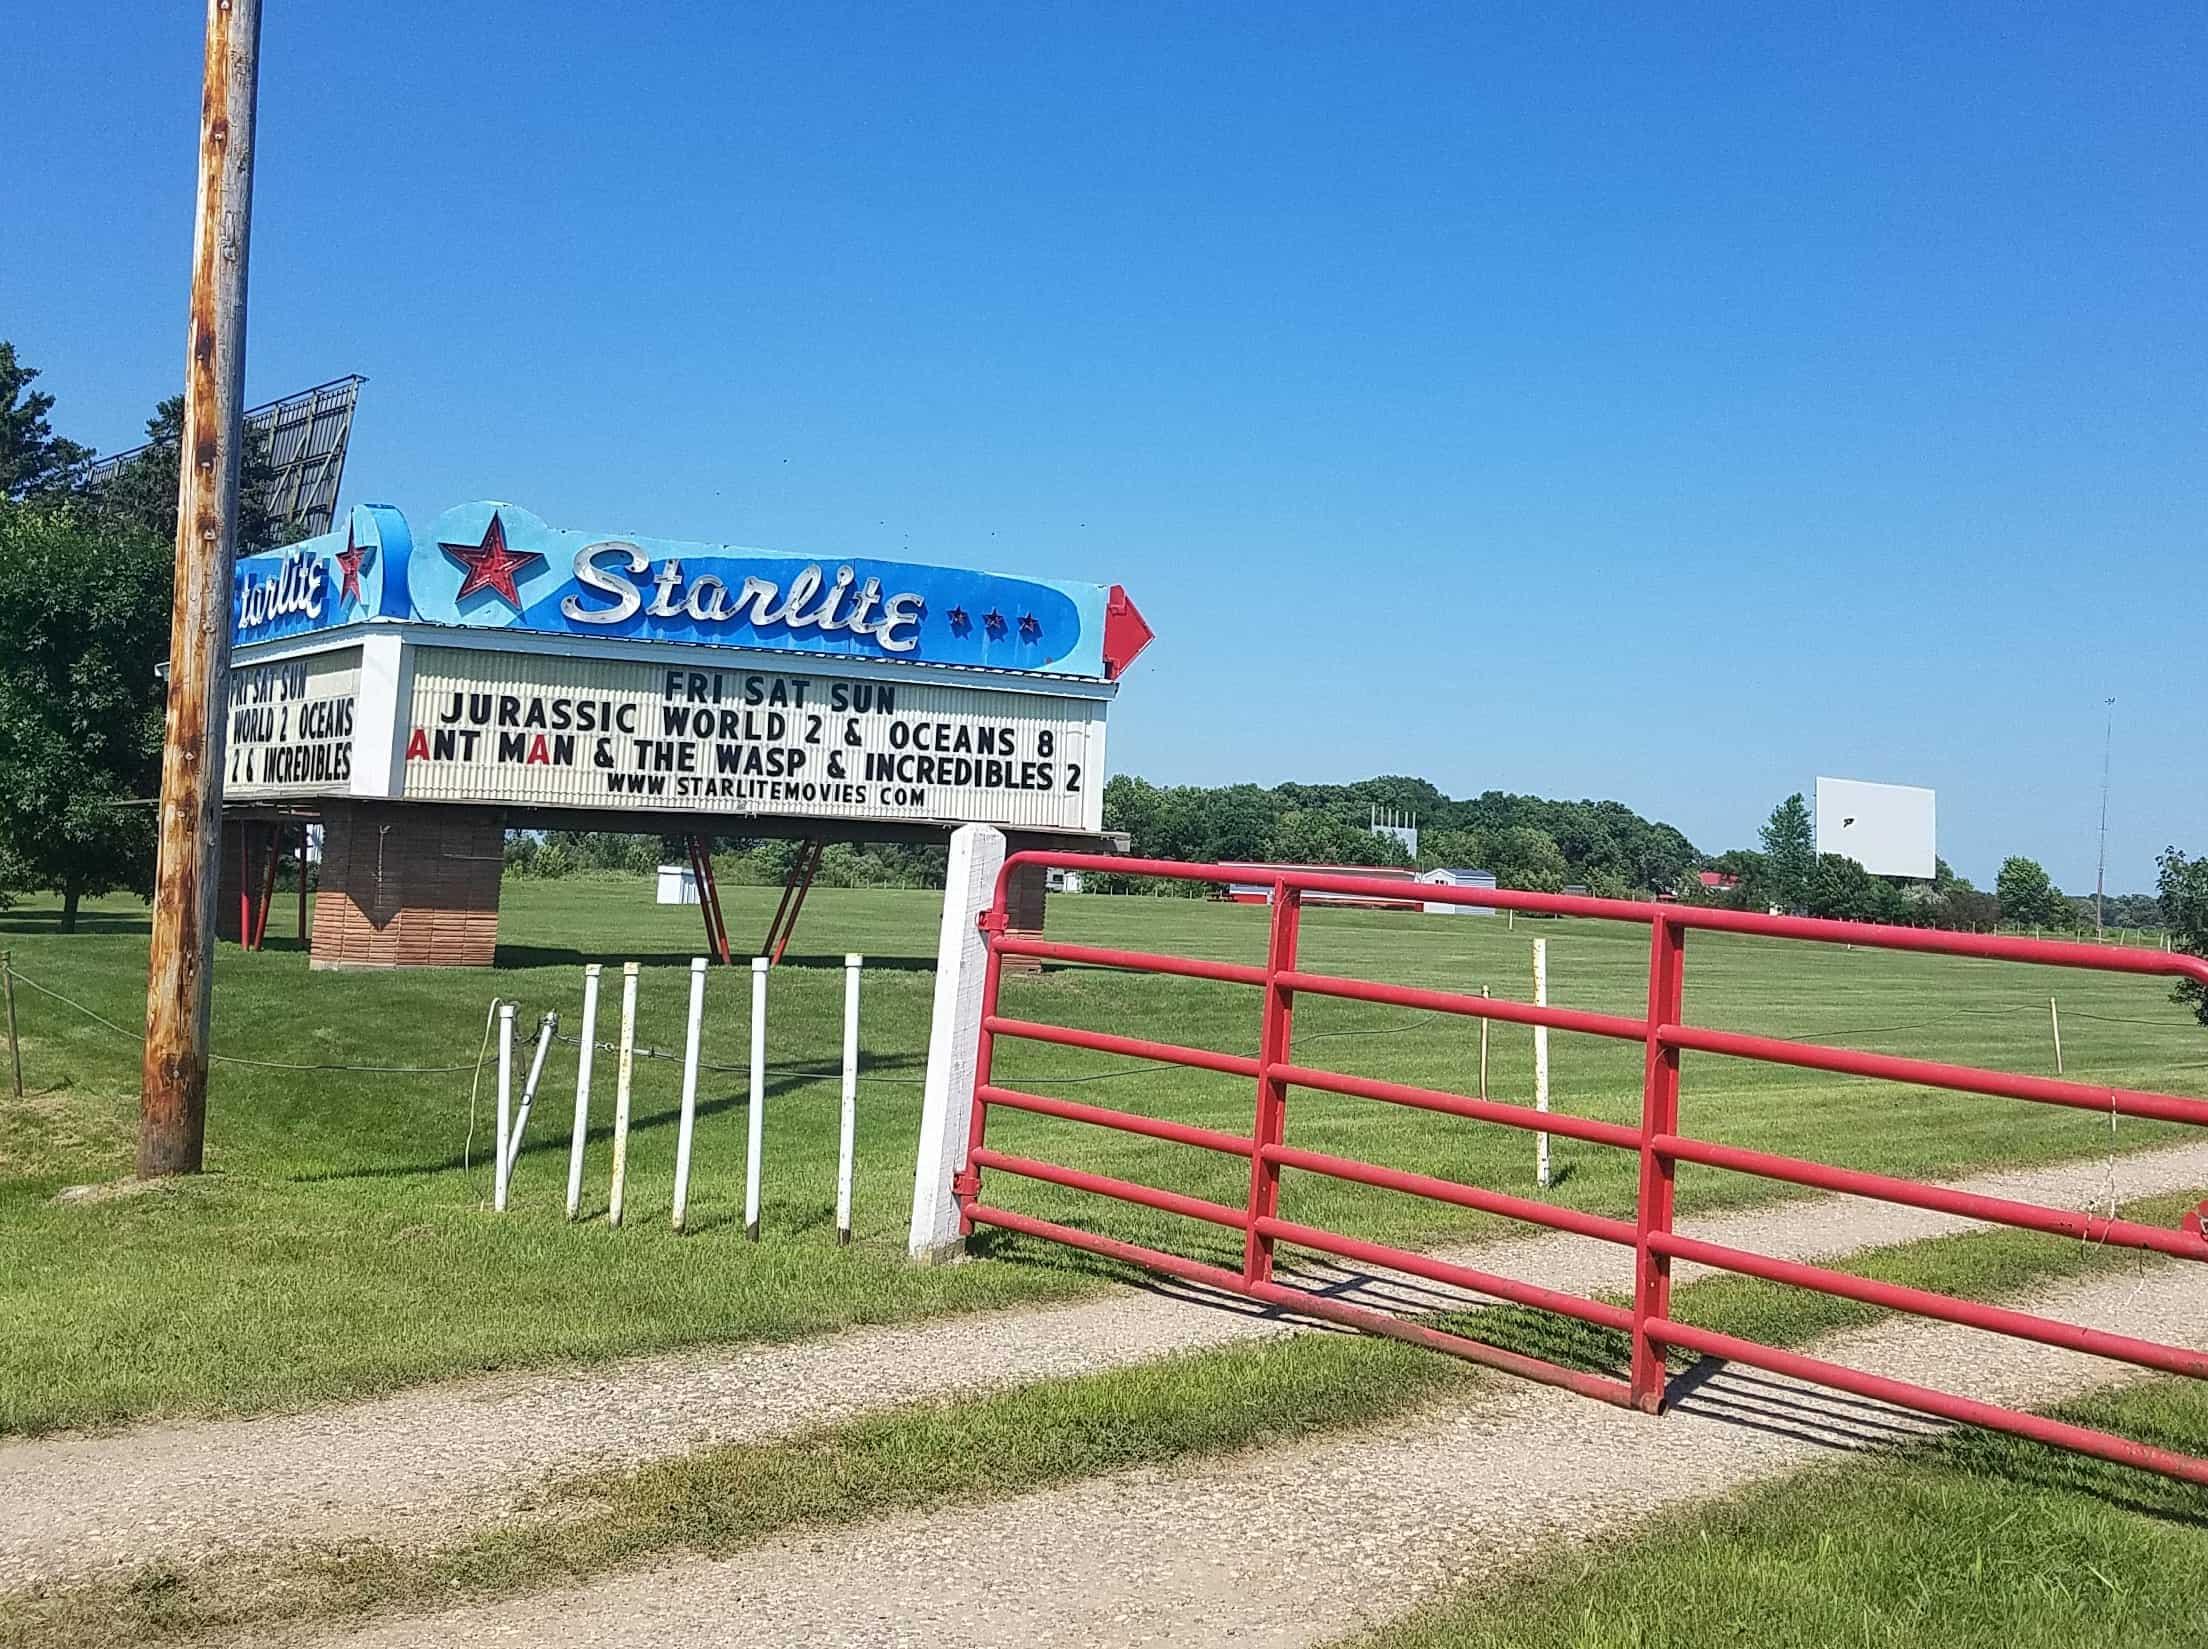 The Starlite Drive-in. (Photo provided)